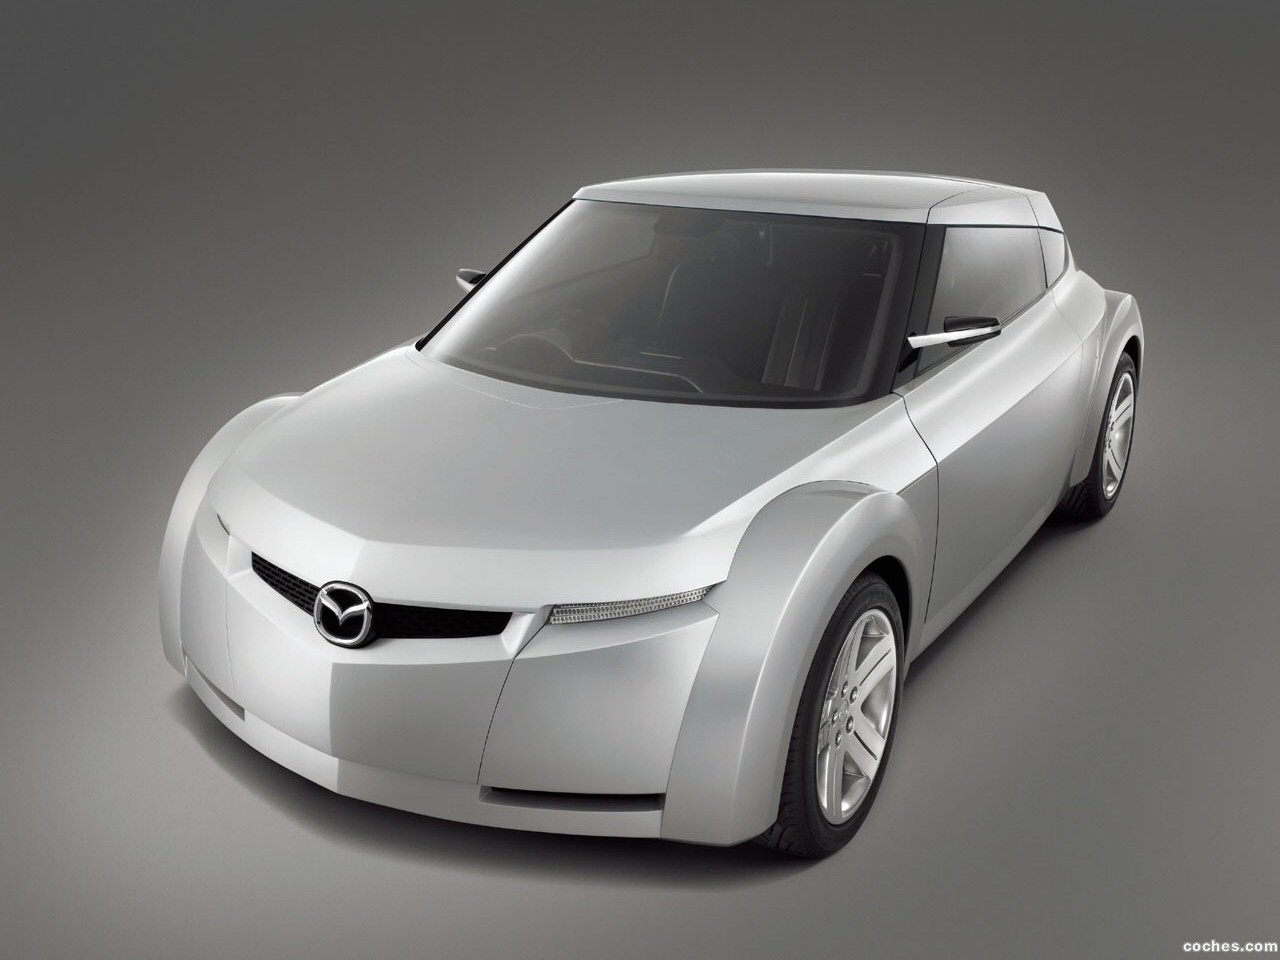 Foto 0 de Mazda Kusabi Concept 2003